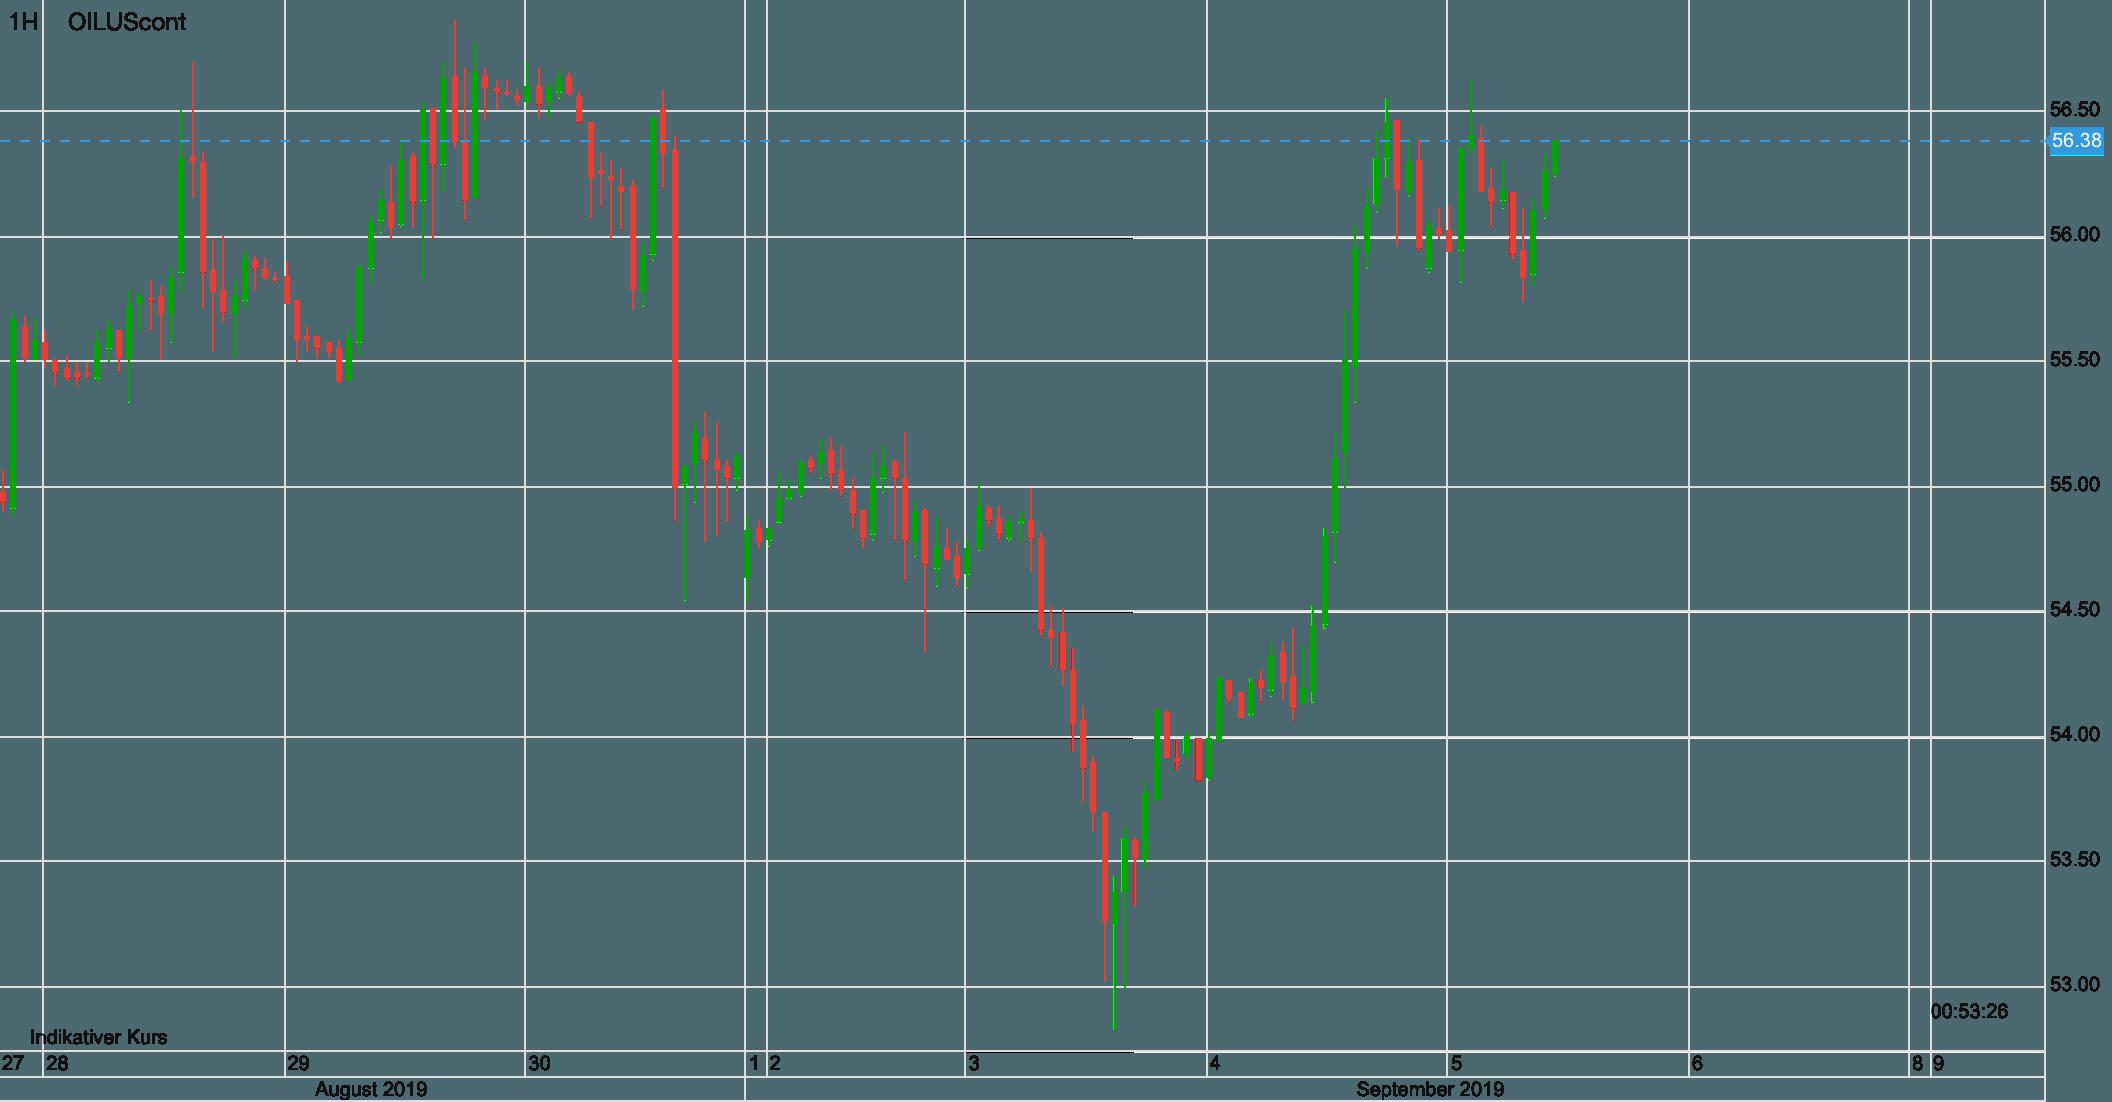 Ölpreis WTI seit 28. August